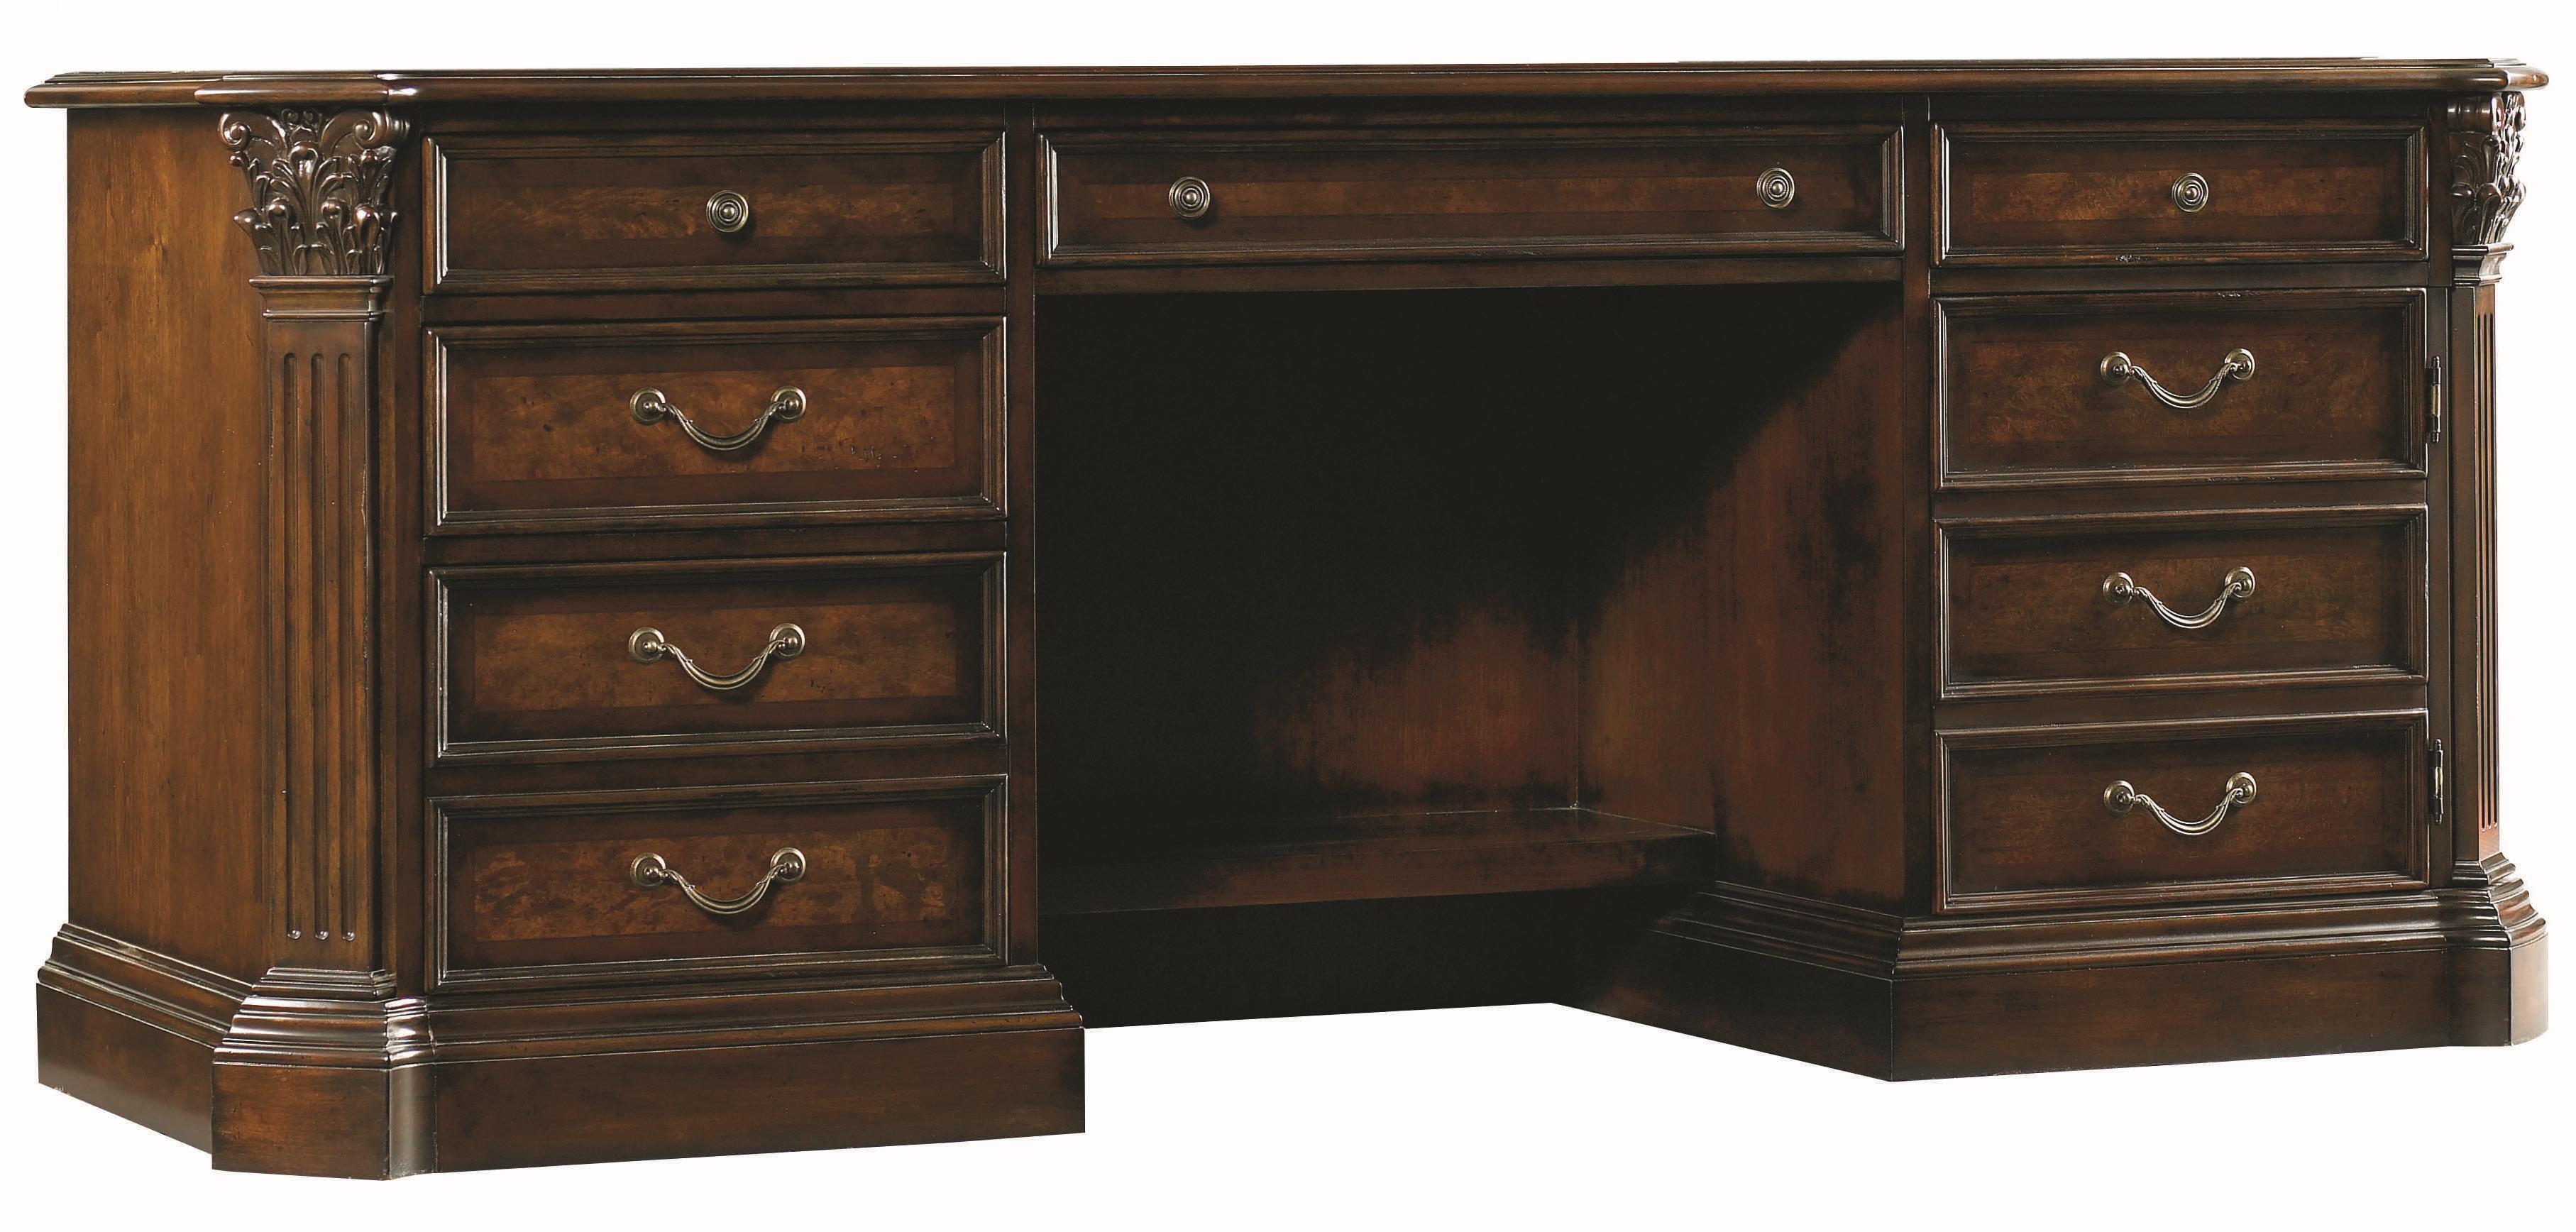 Hooker Furniture European Renaissance II Computer Credenza - Item Number: 374-10-464